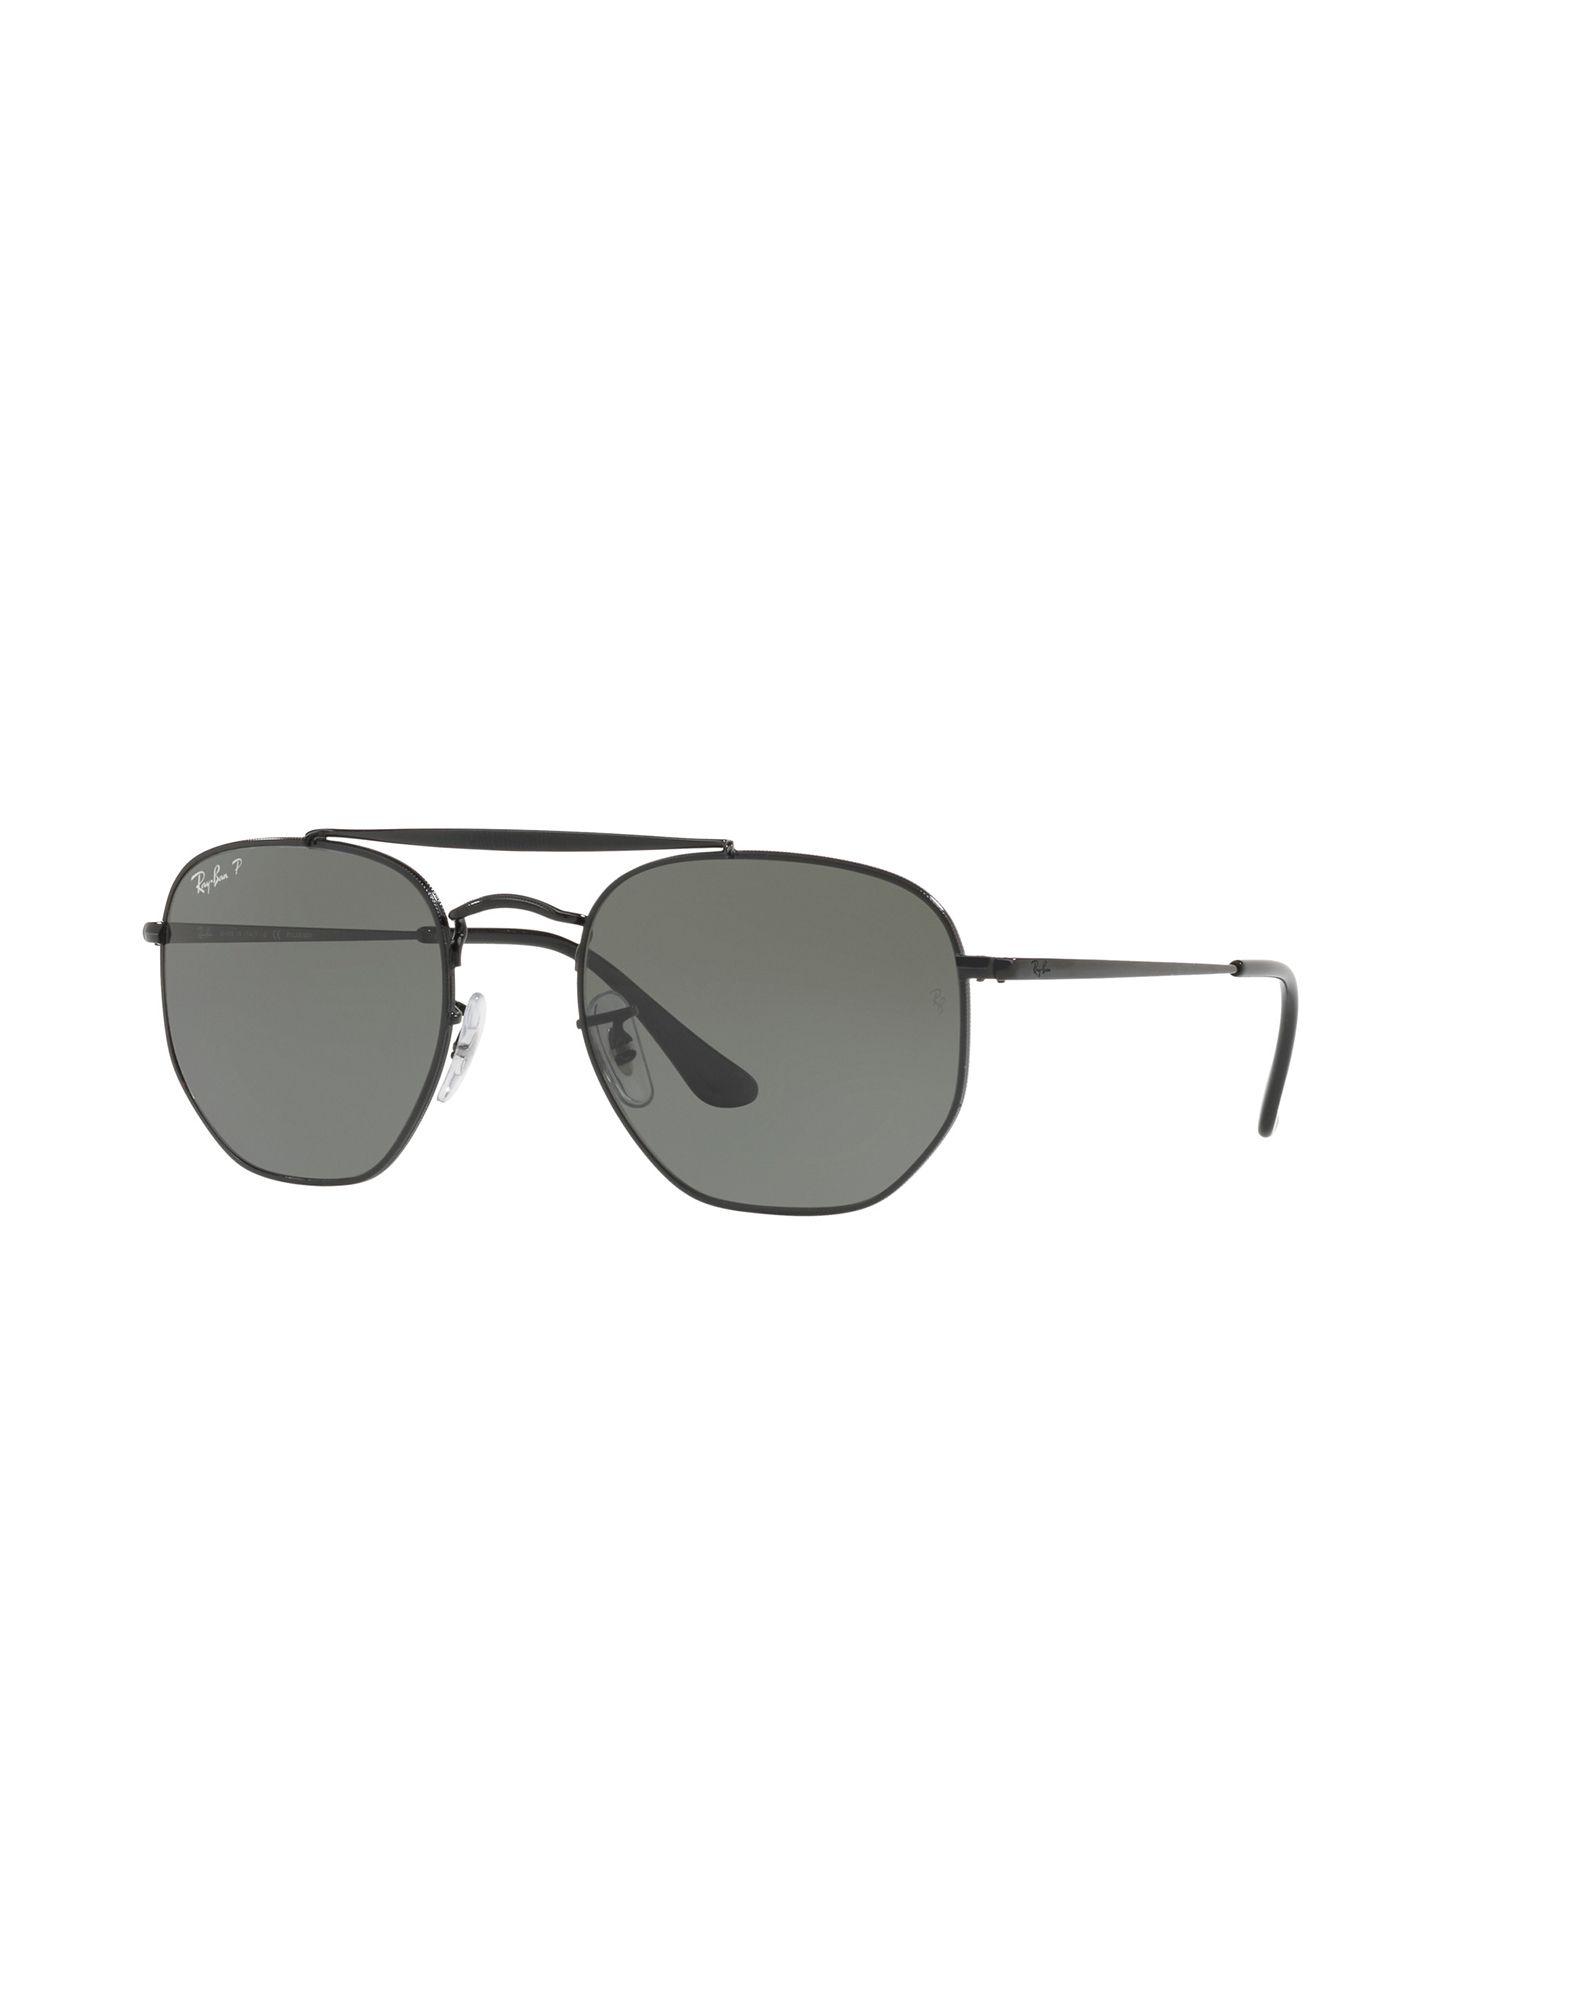 RAY-BAN Солнечные очки rayban ray ban очки партии дарен серии мужчин и женщин черная рамка зеленый объектив солнцезащитные очки rb4246 901 51 мм